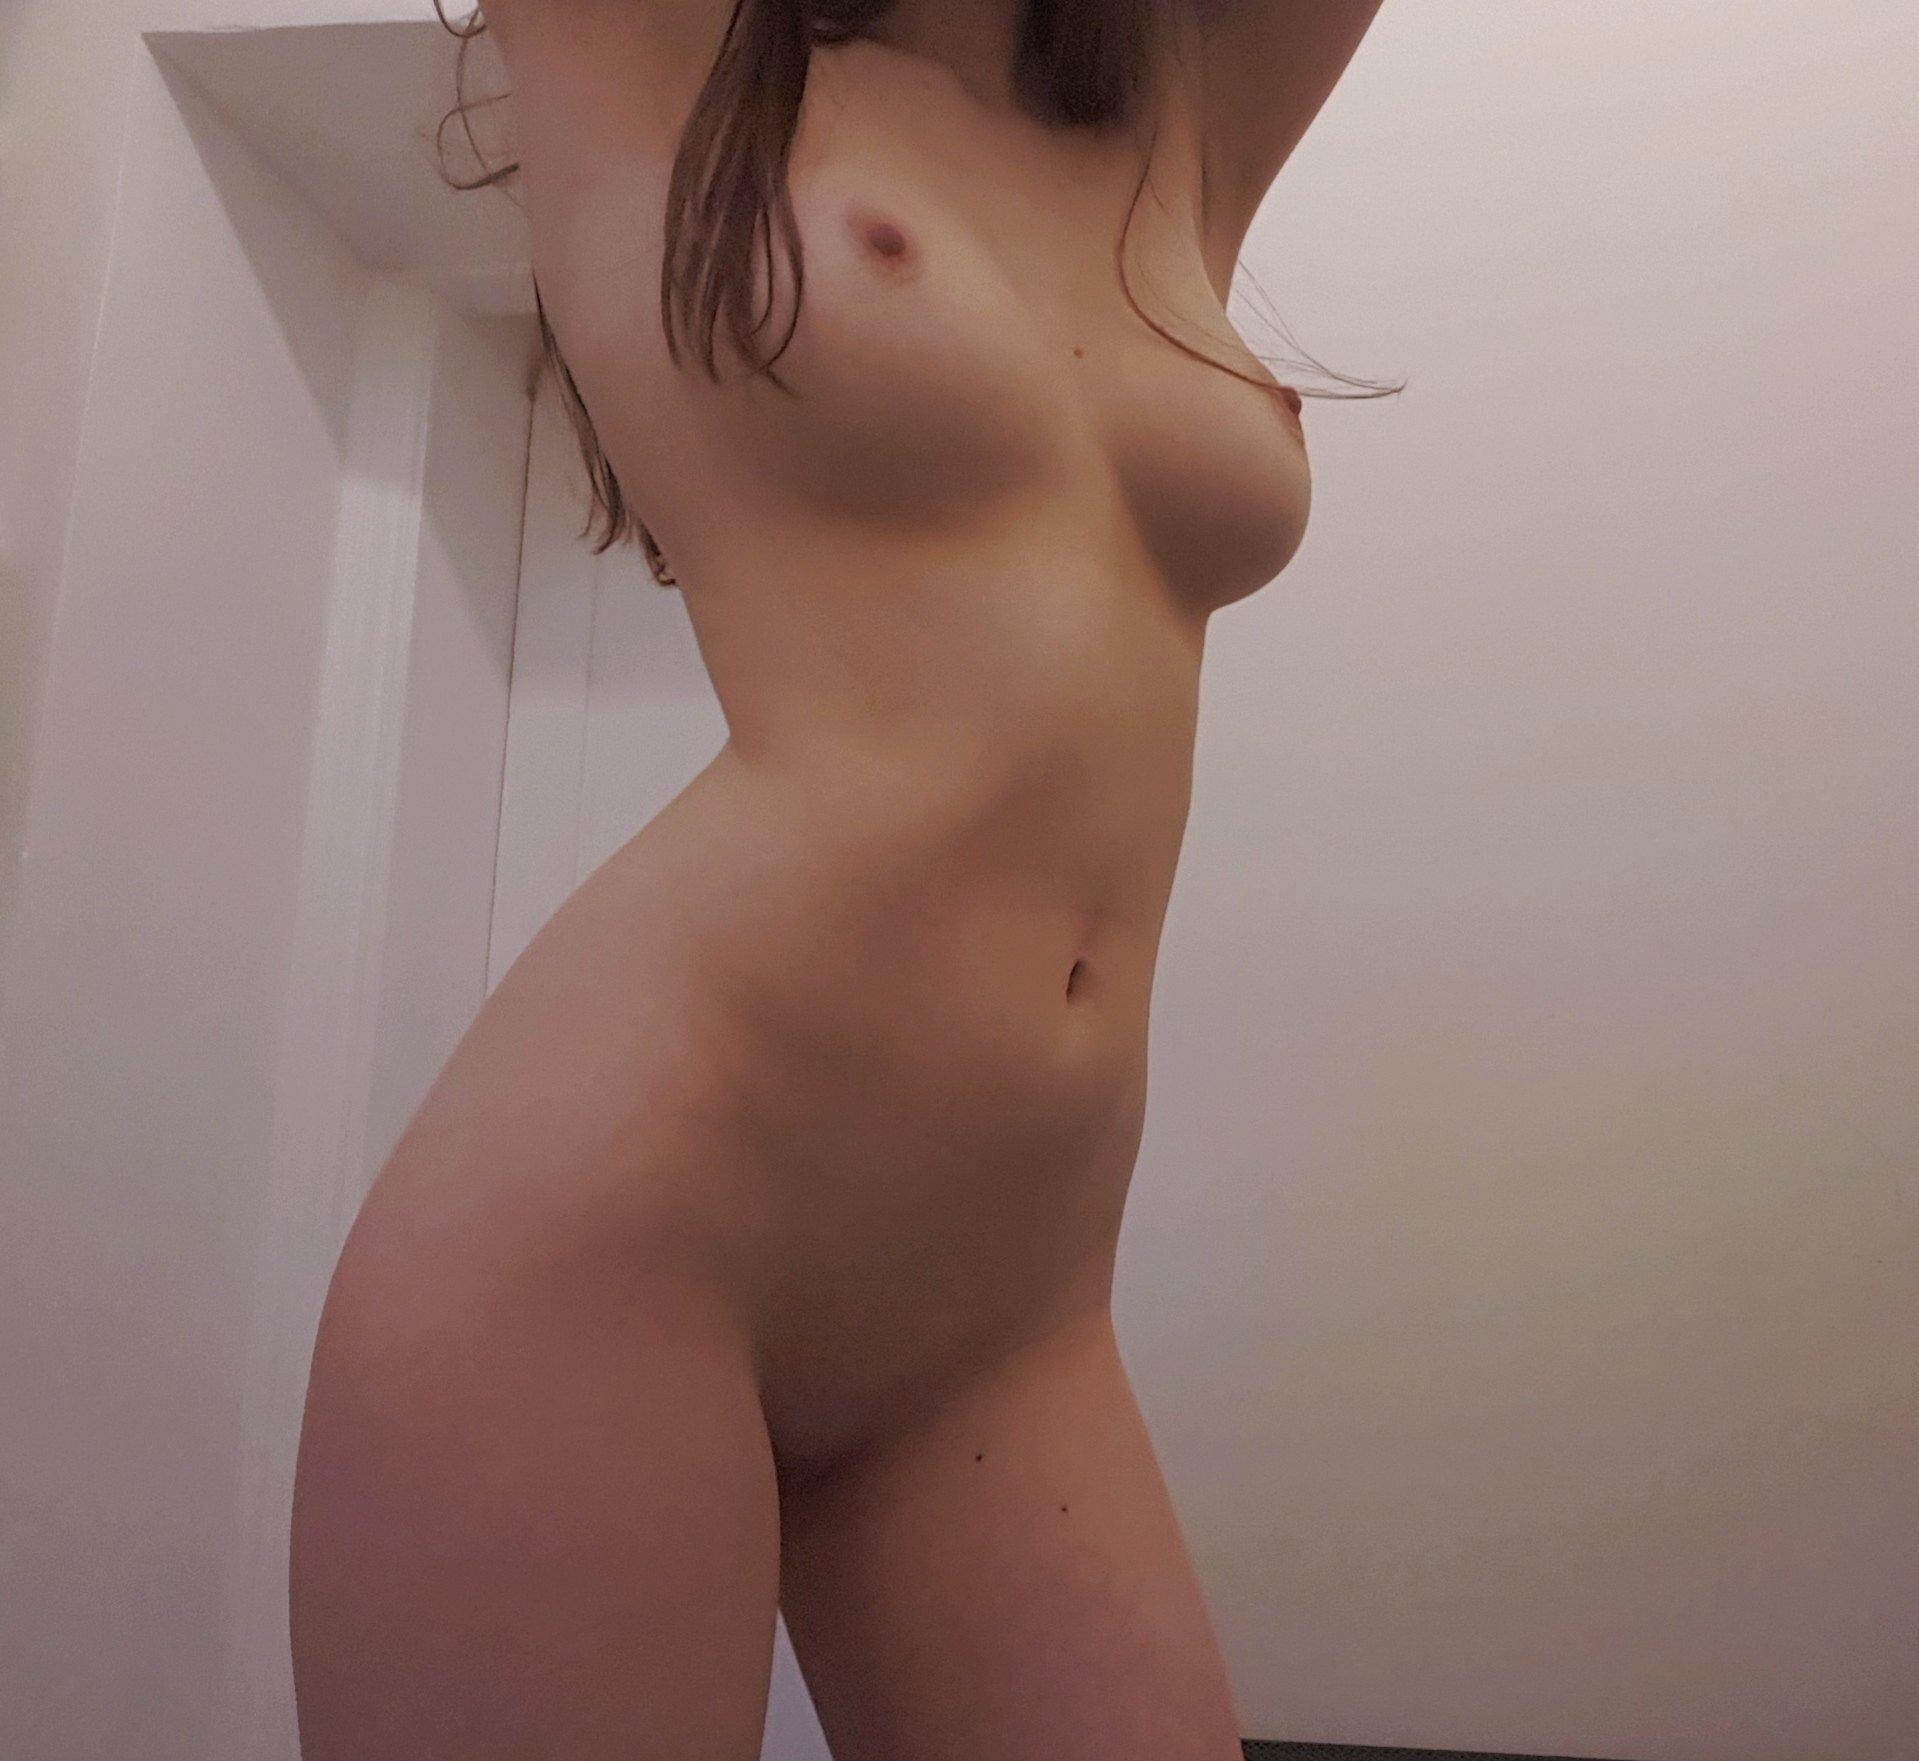 Allie Alliensfw Onlyfans Nude Leaks 0028